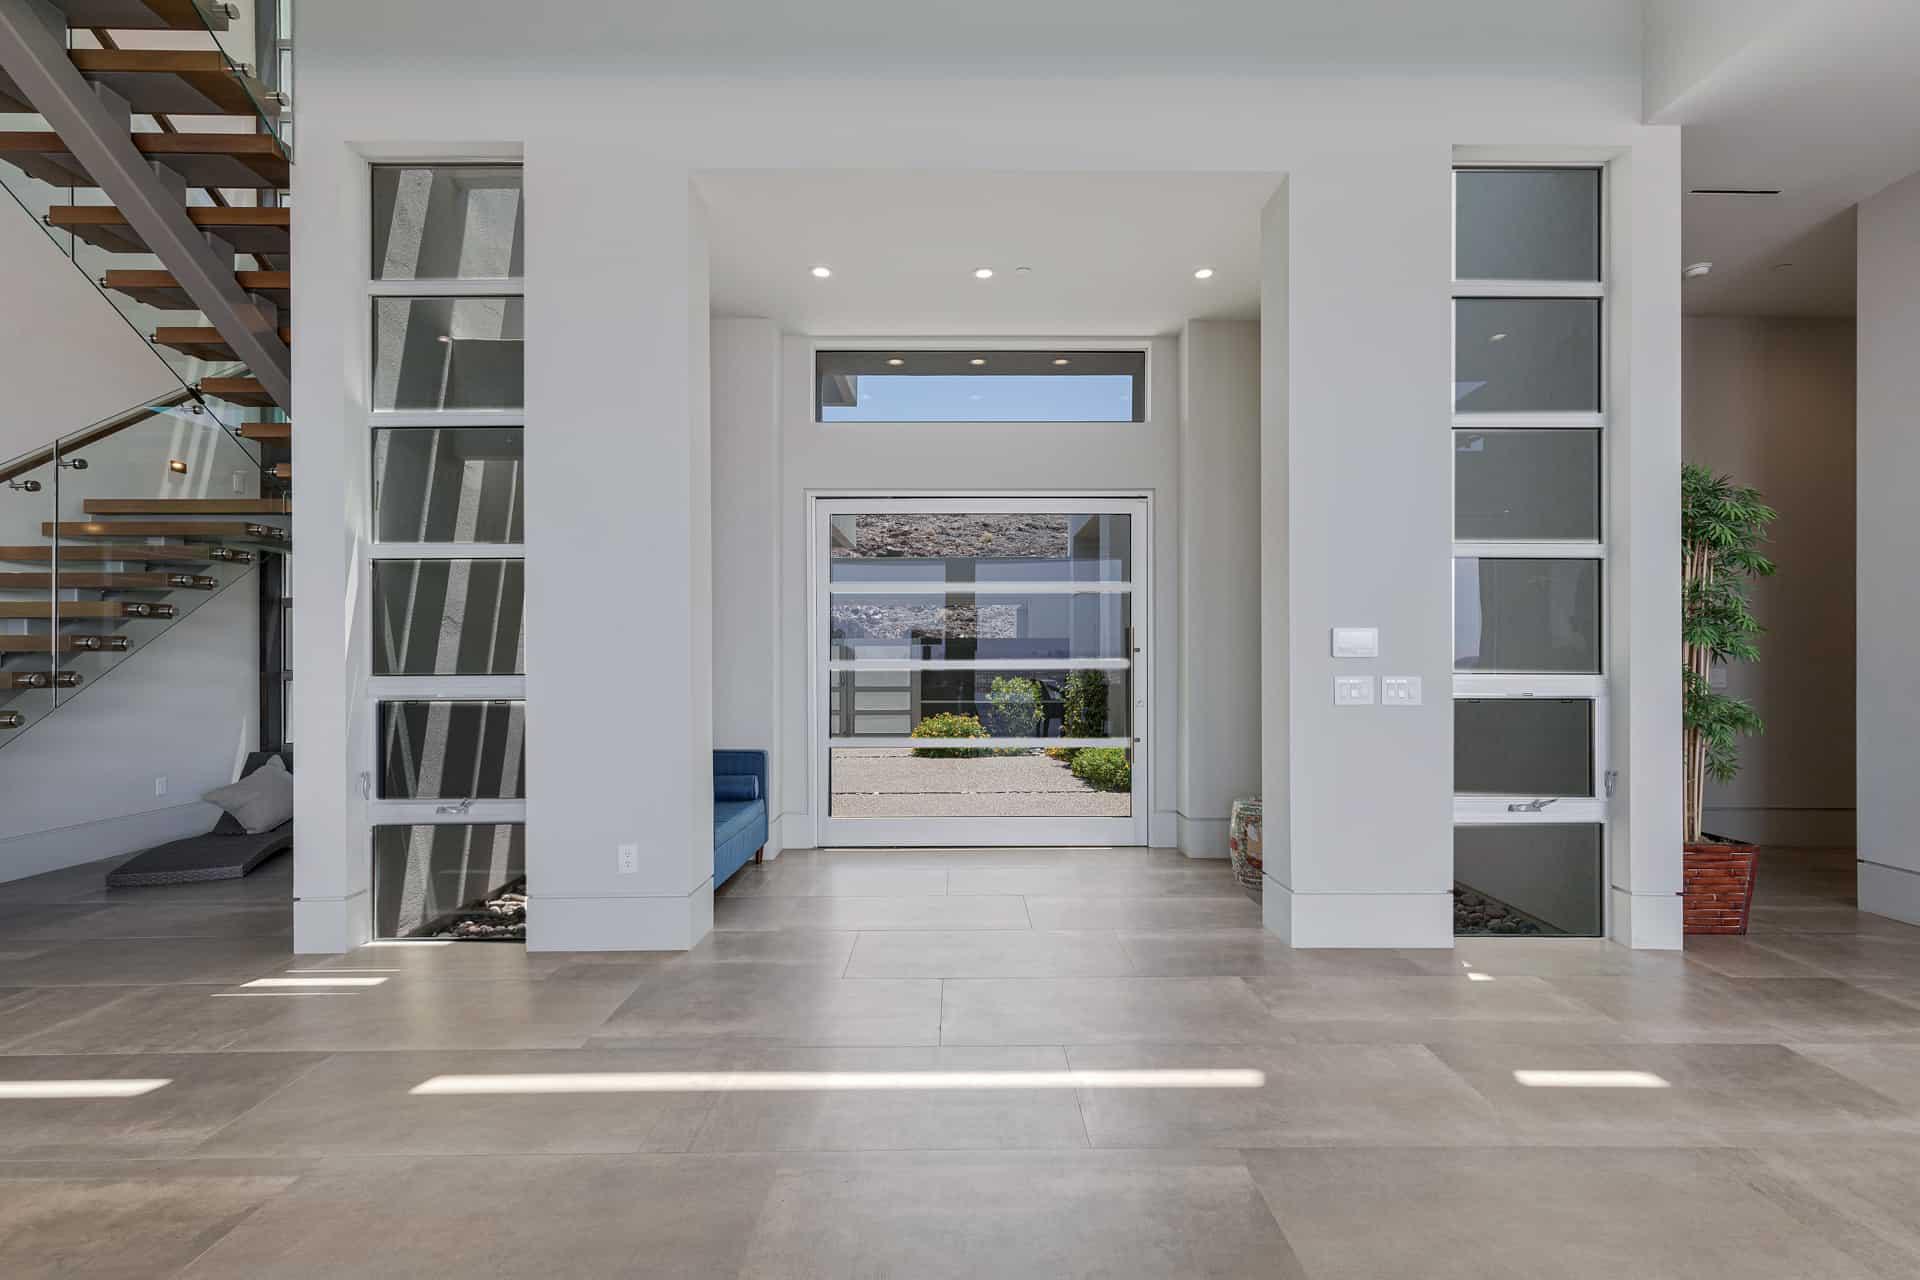 las-vegas-luxry-real-estate-realtor-rob-jensen-company-5-rockstream-drive-ascaya017